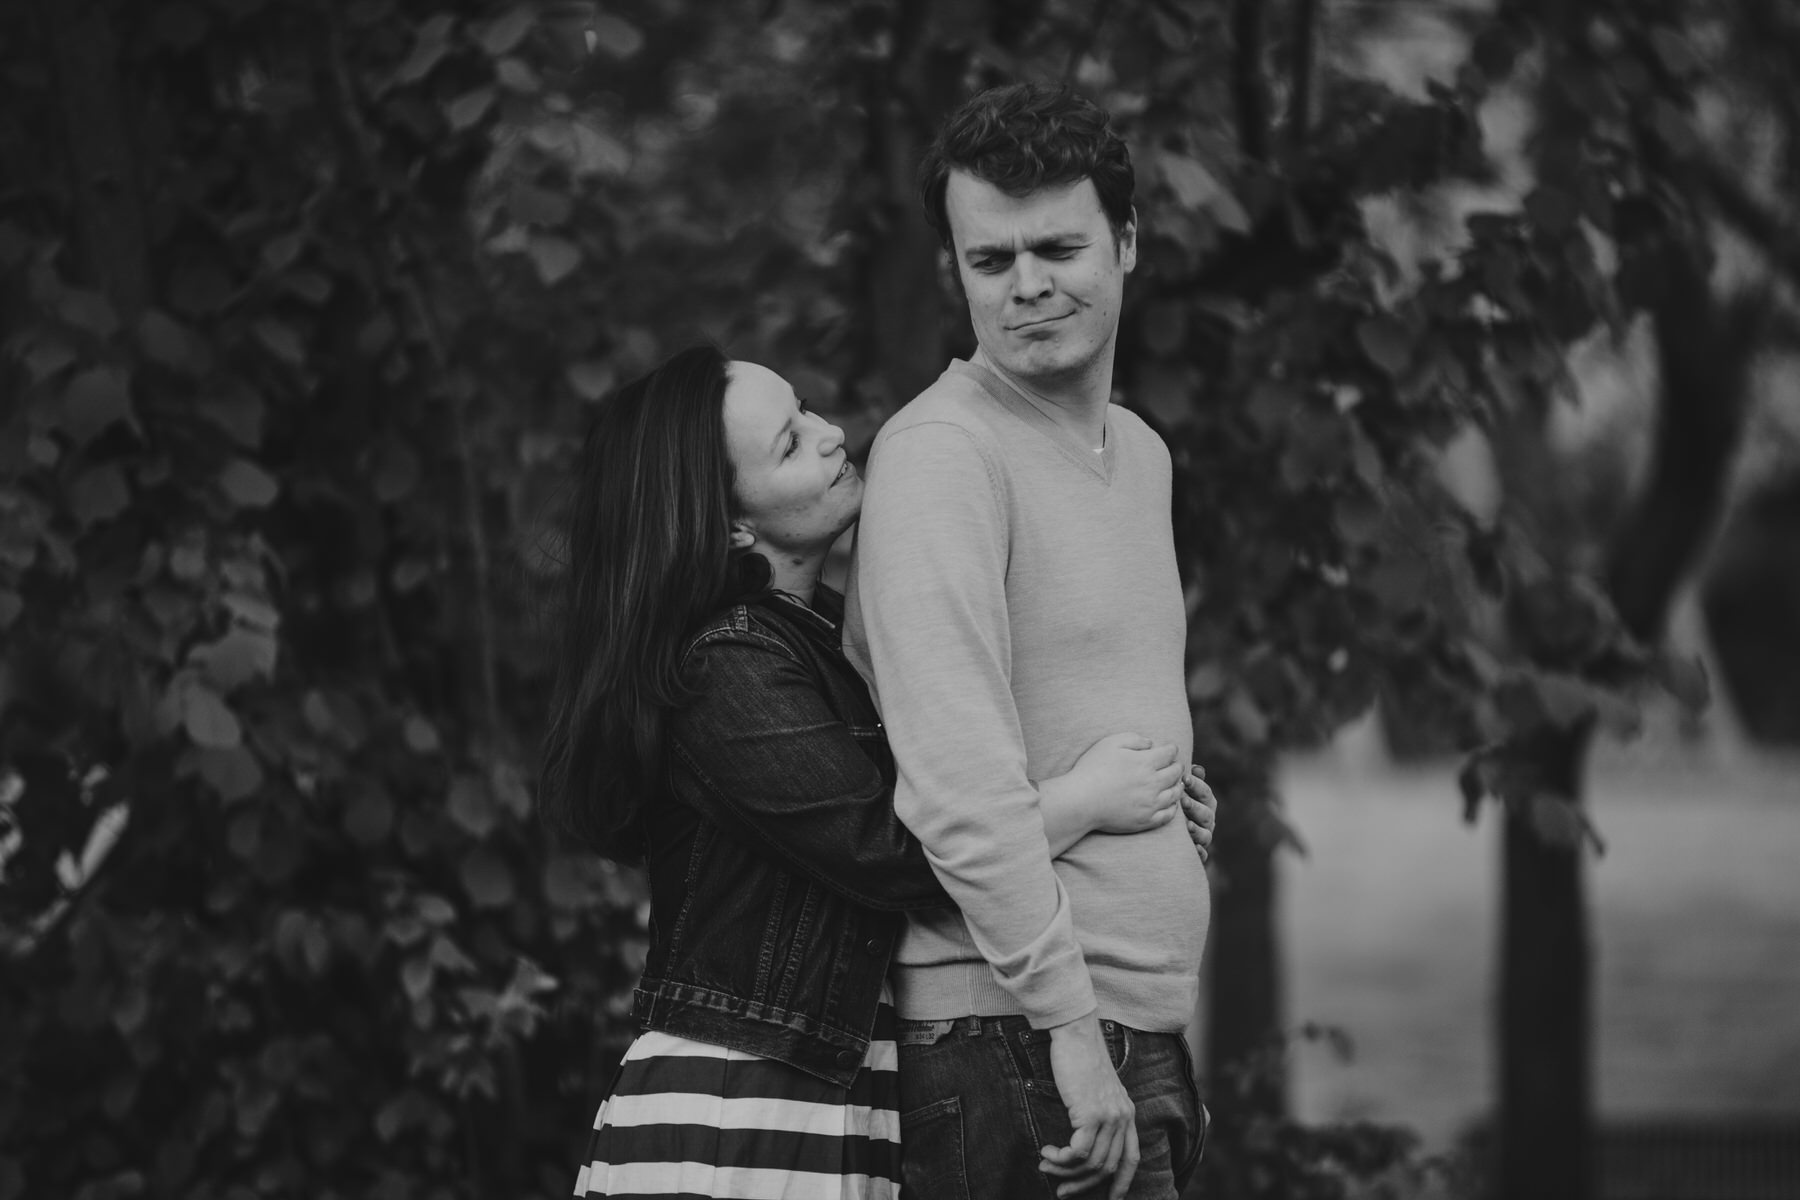 88-Quirky-engagement-London-cute-romantics-BW.jpg